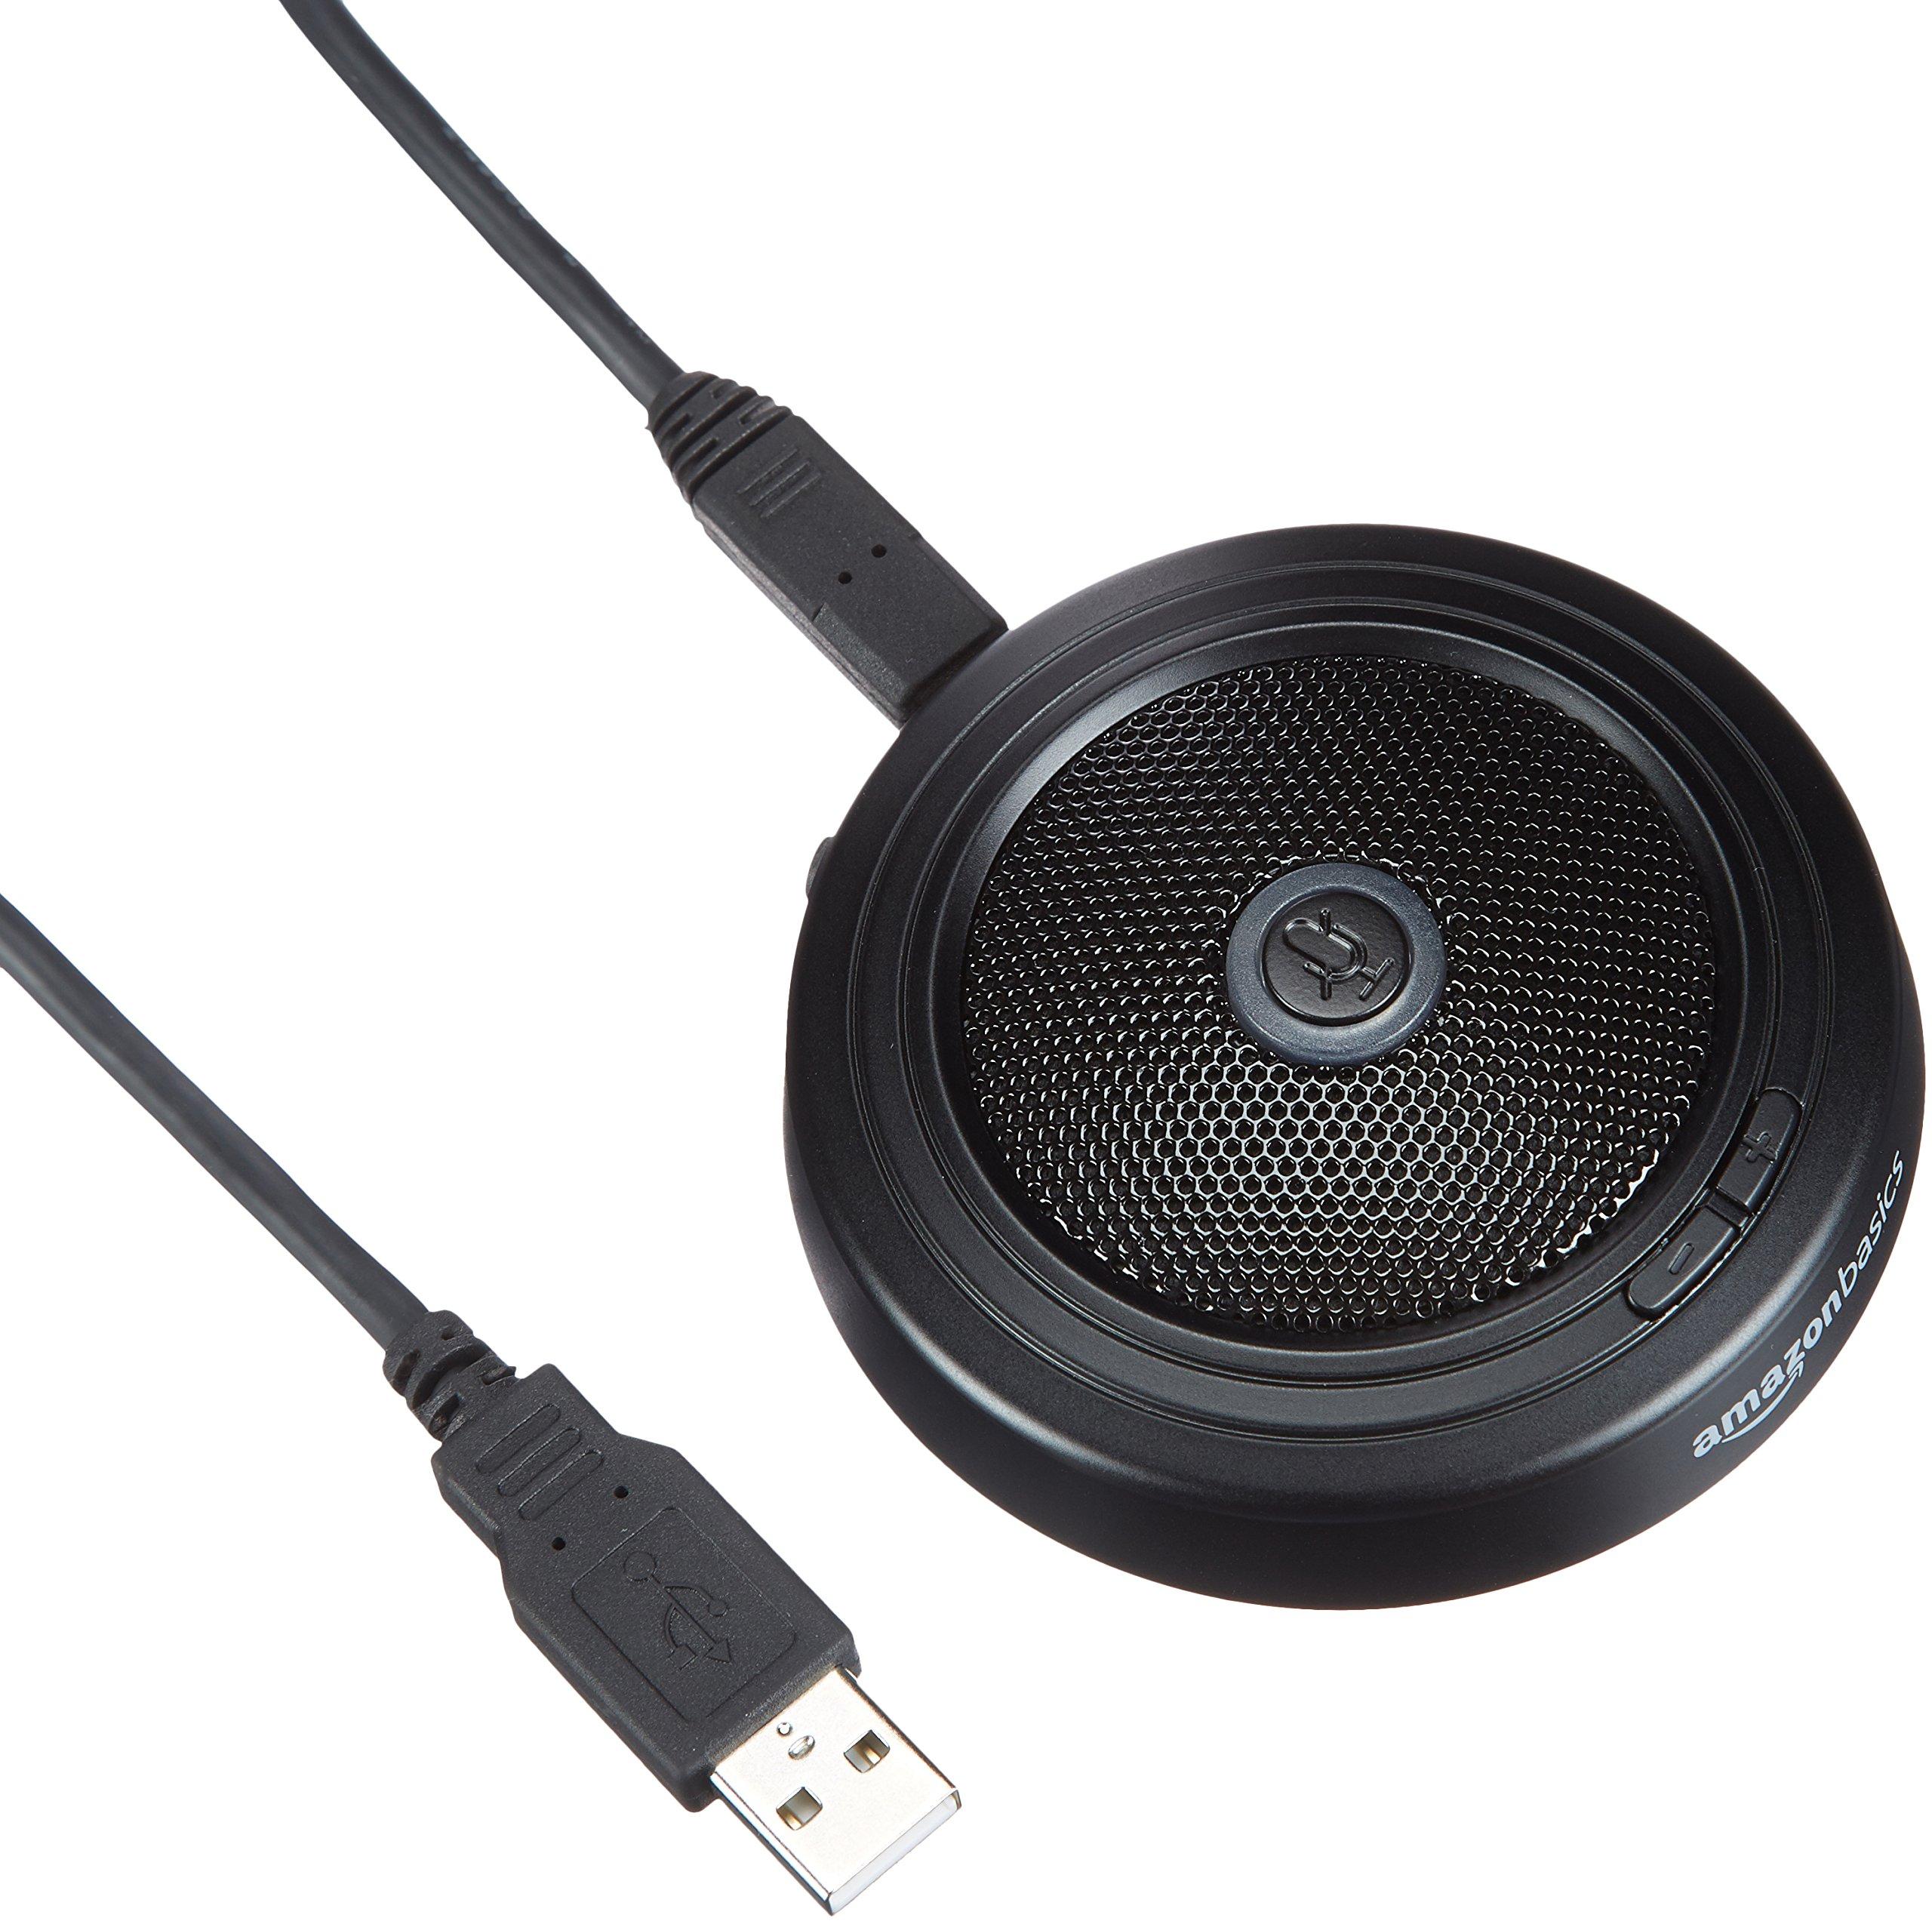 AmazonBasics USB Conference Microphone